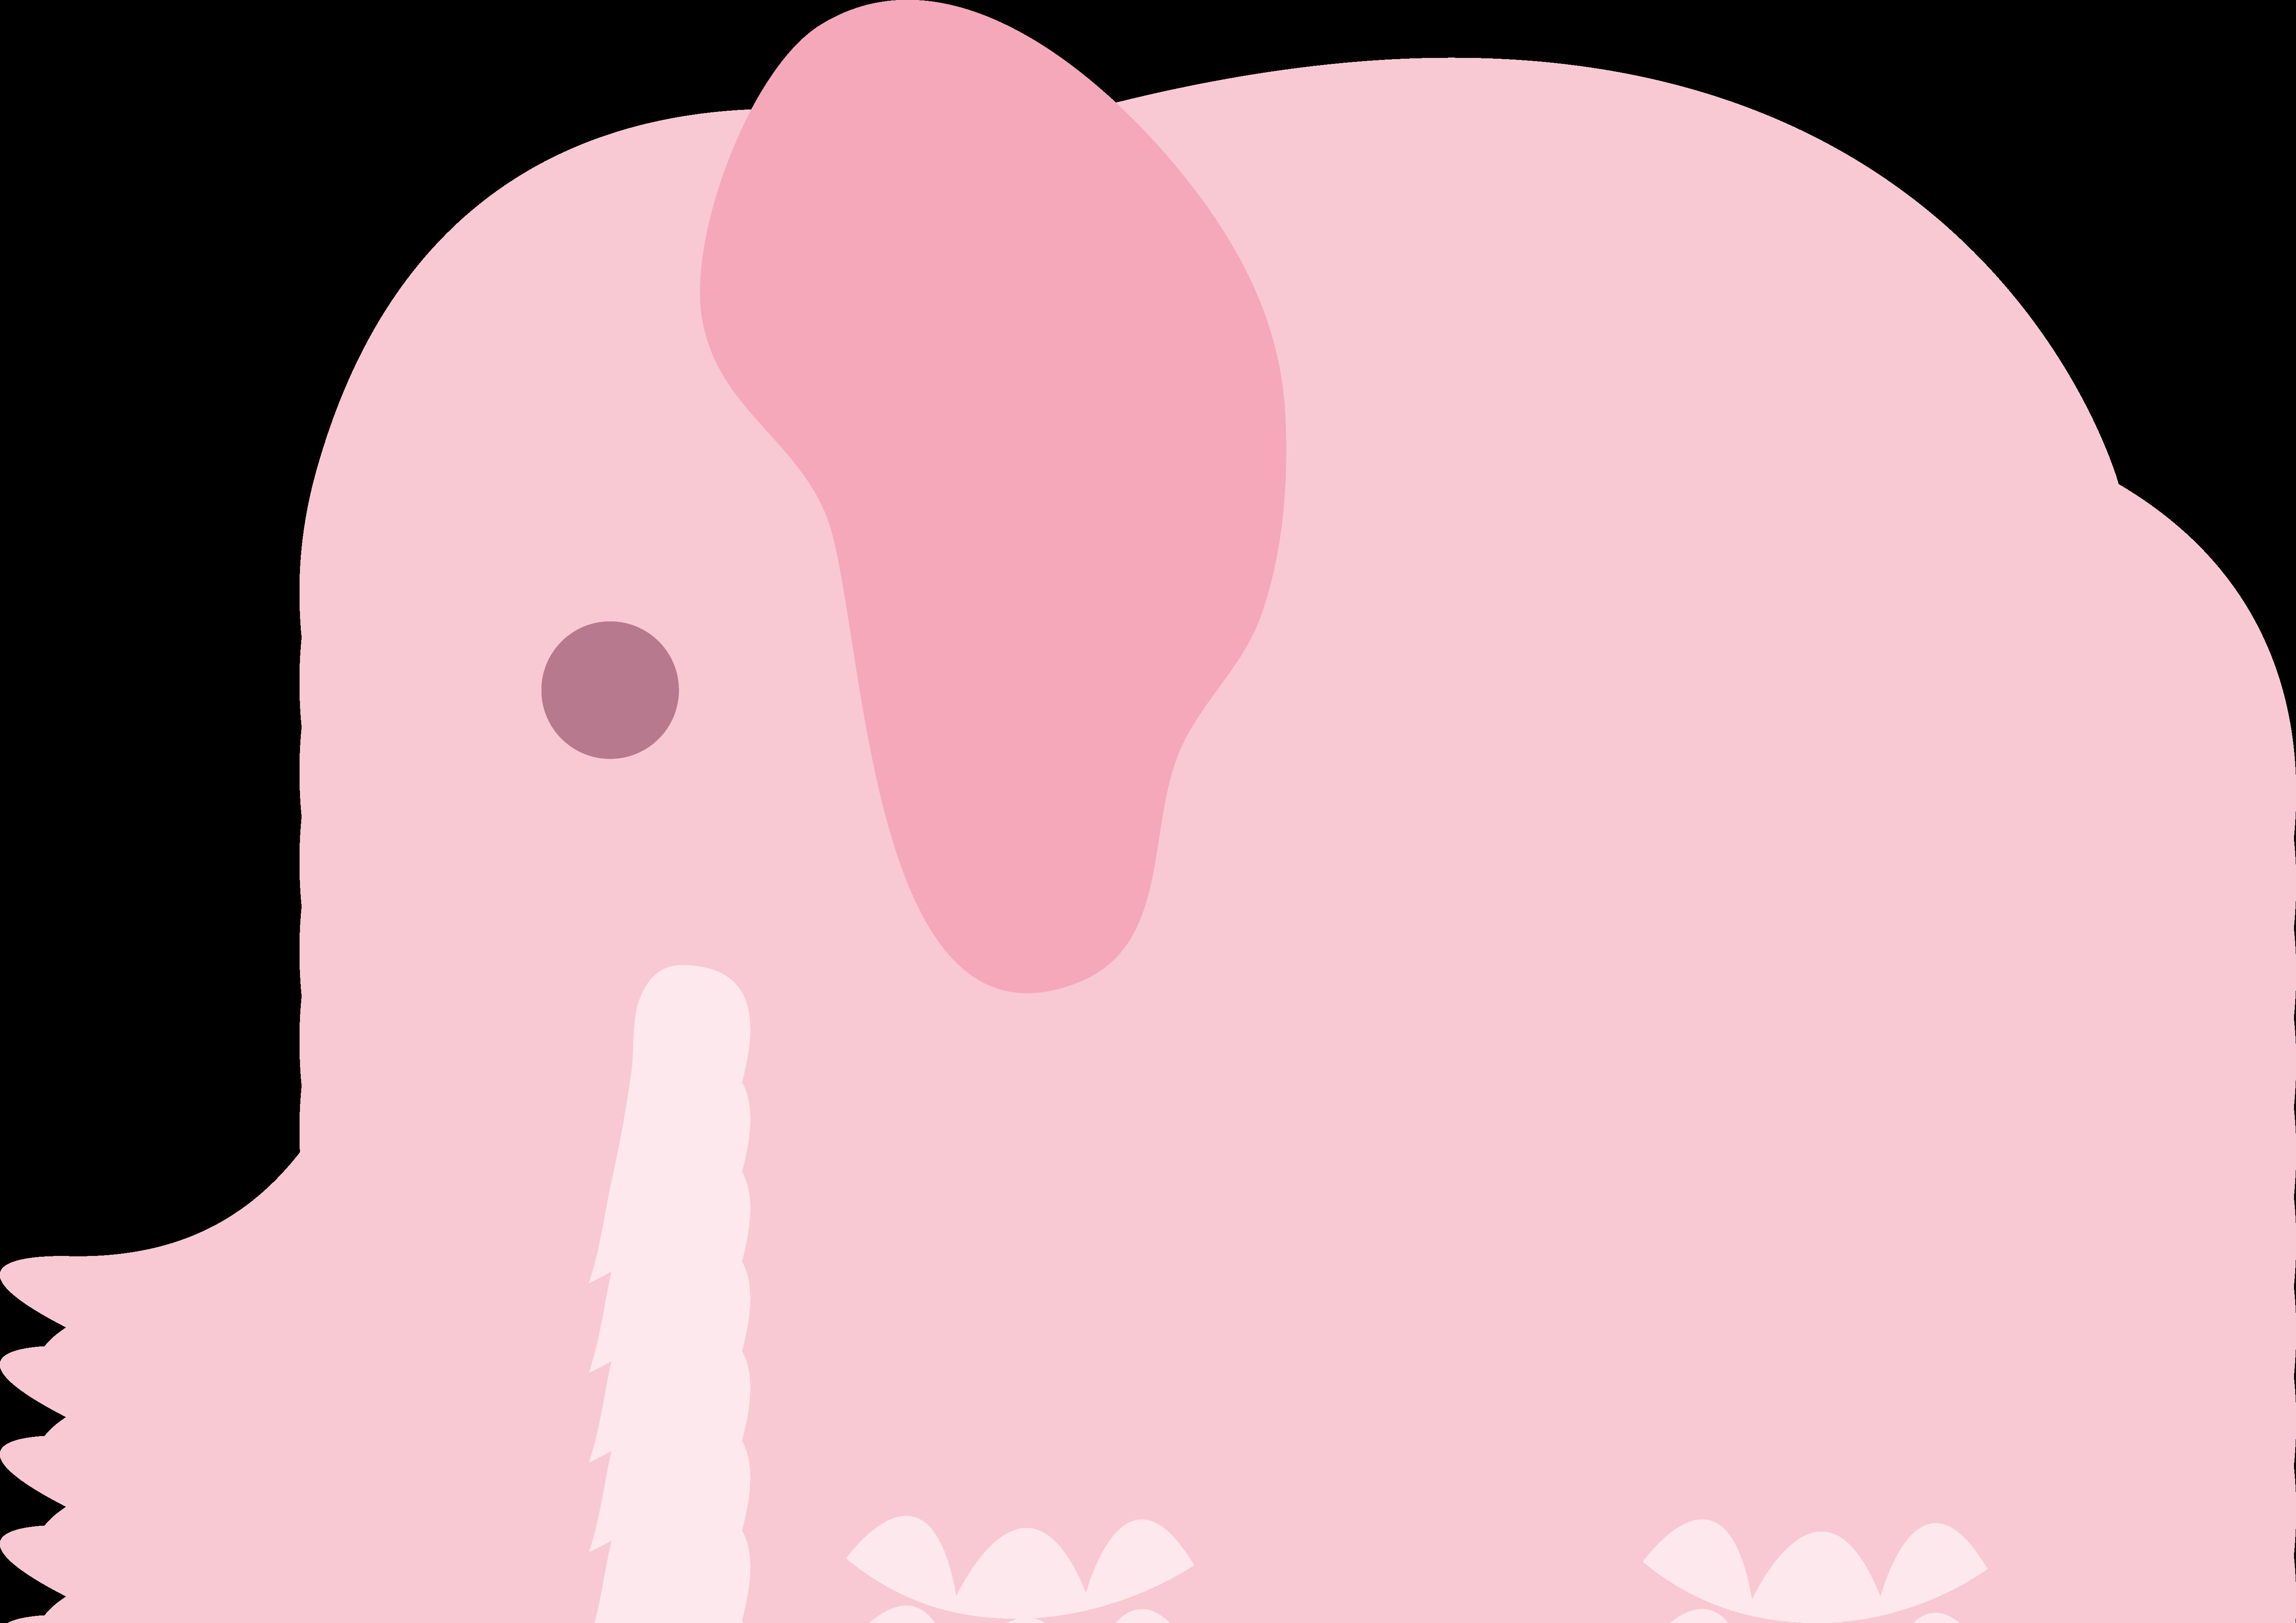 5786x4090 Little Pink Elephant Clip Art